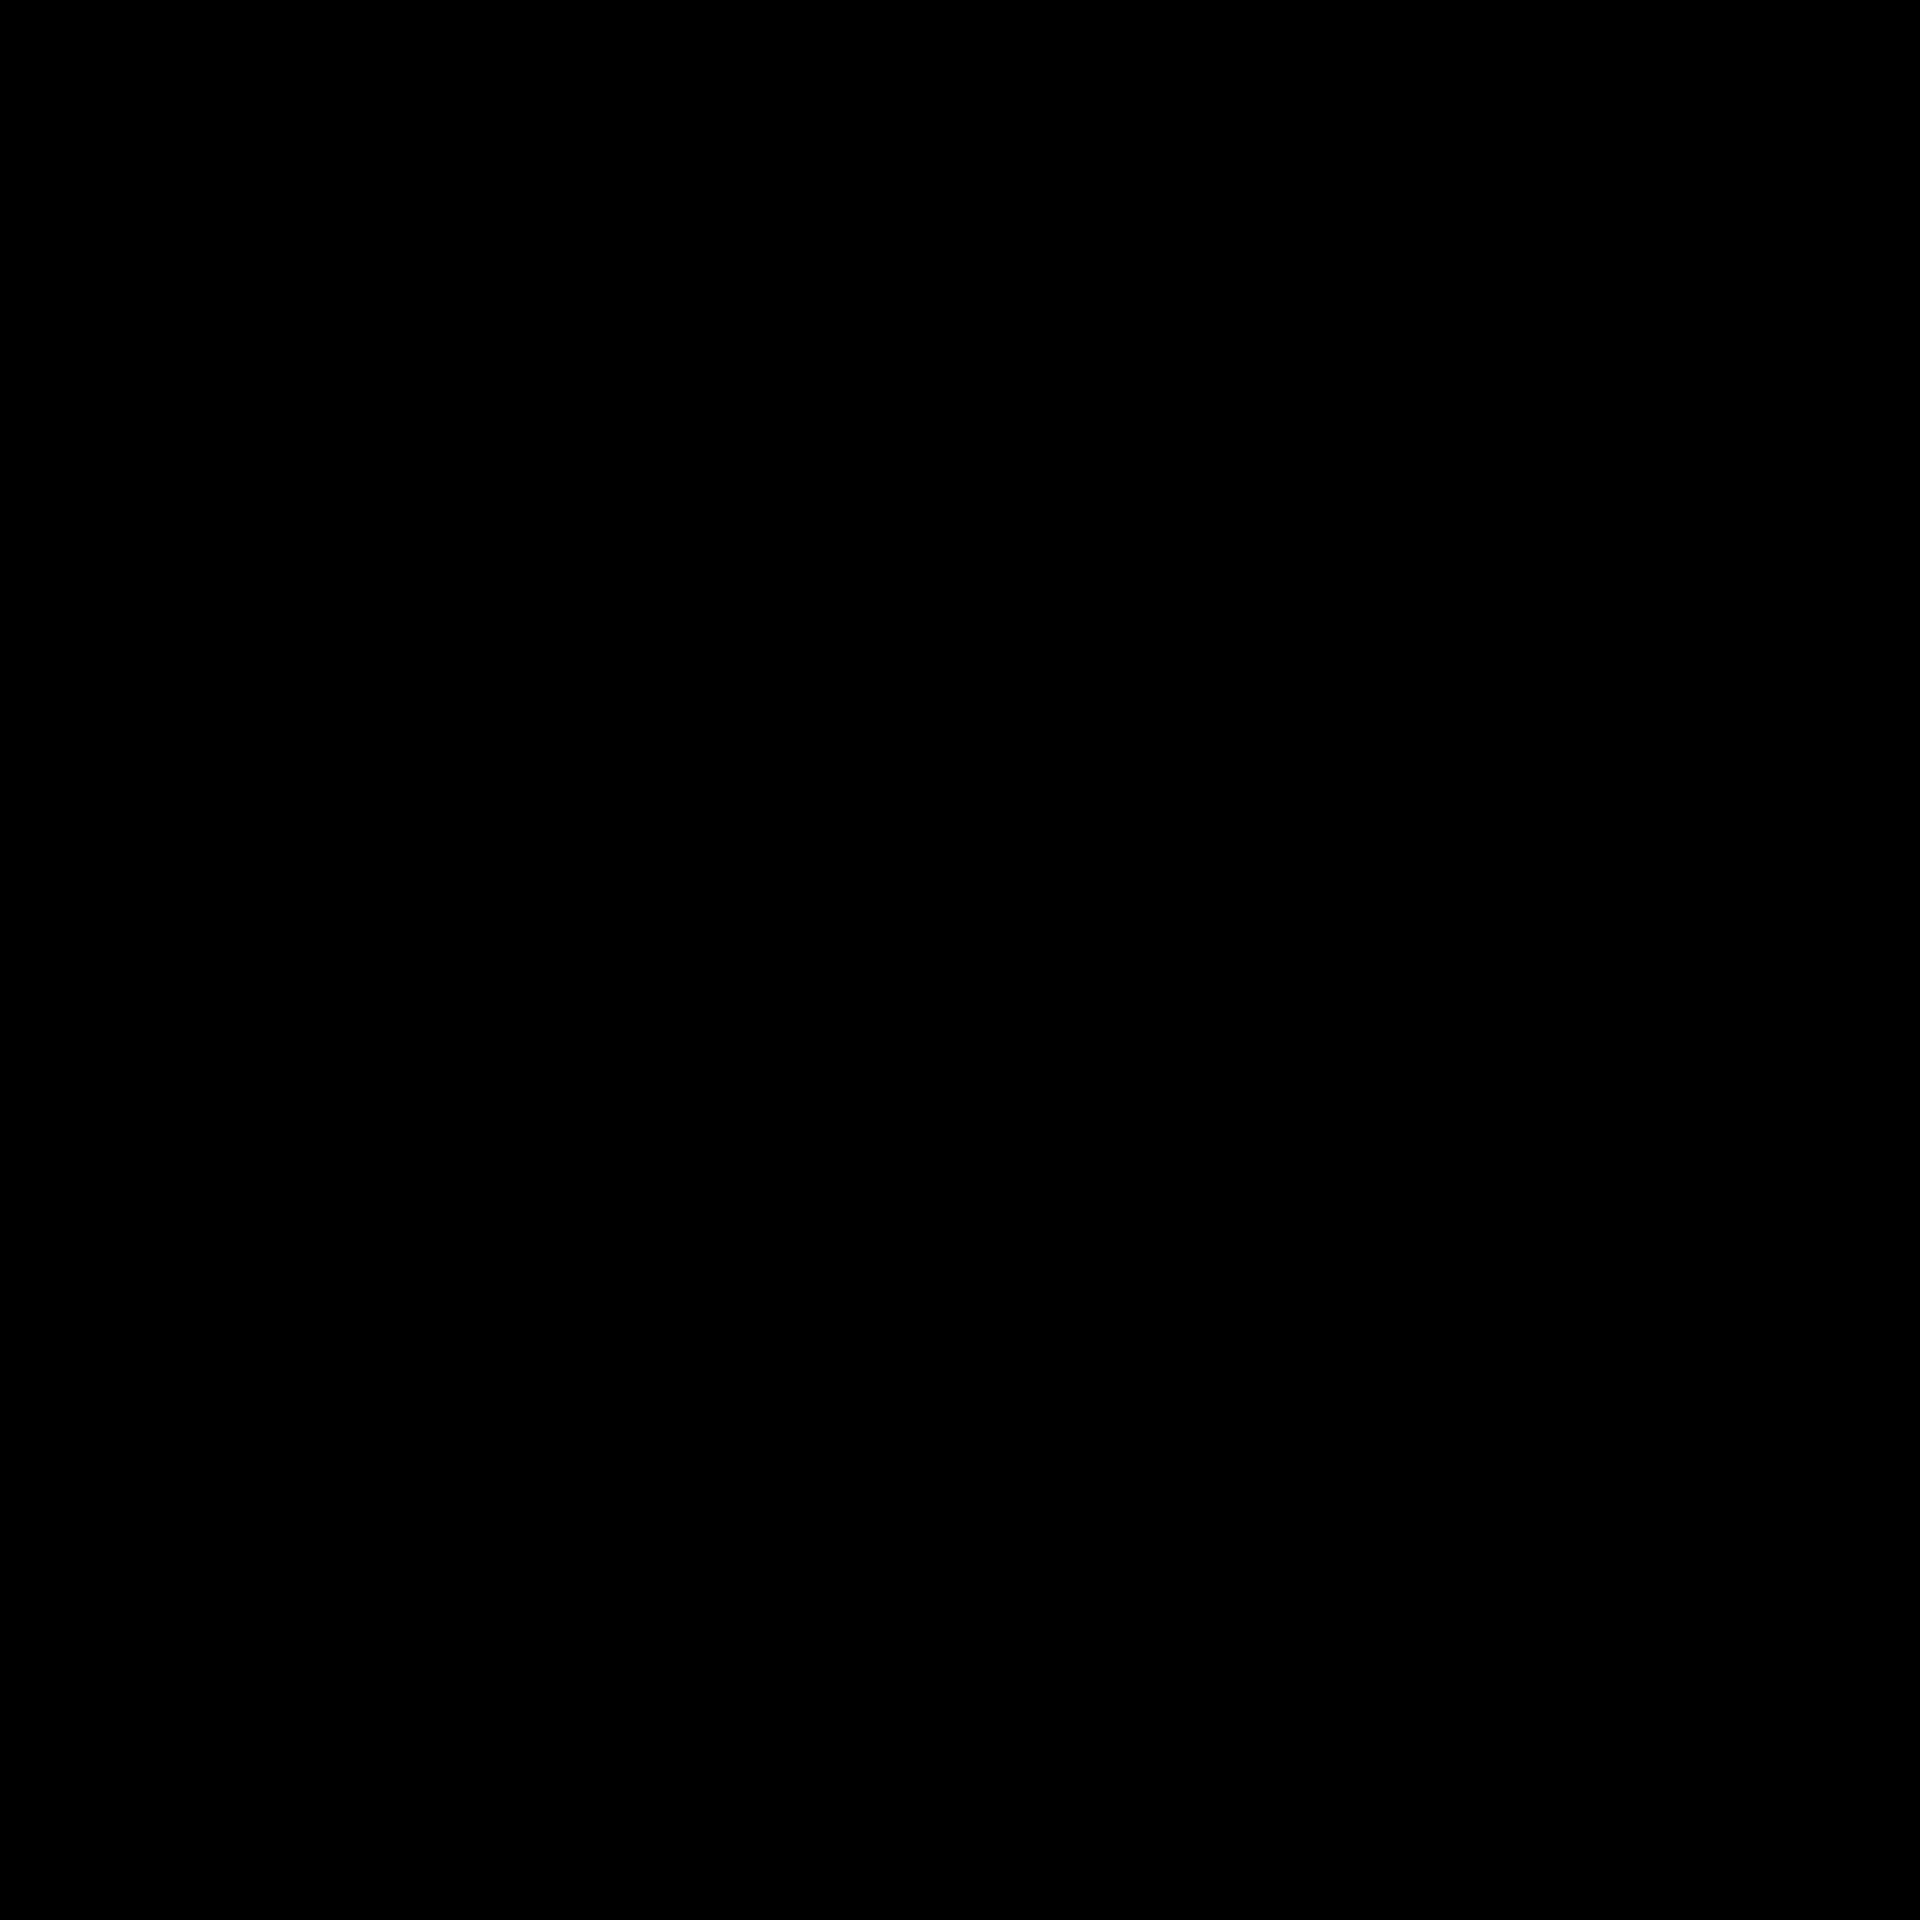 1708 ZT.png